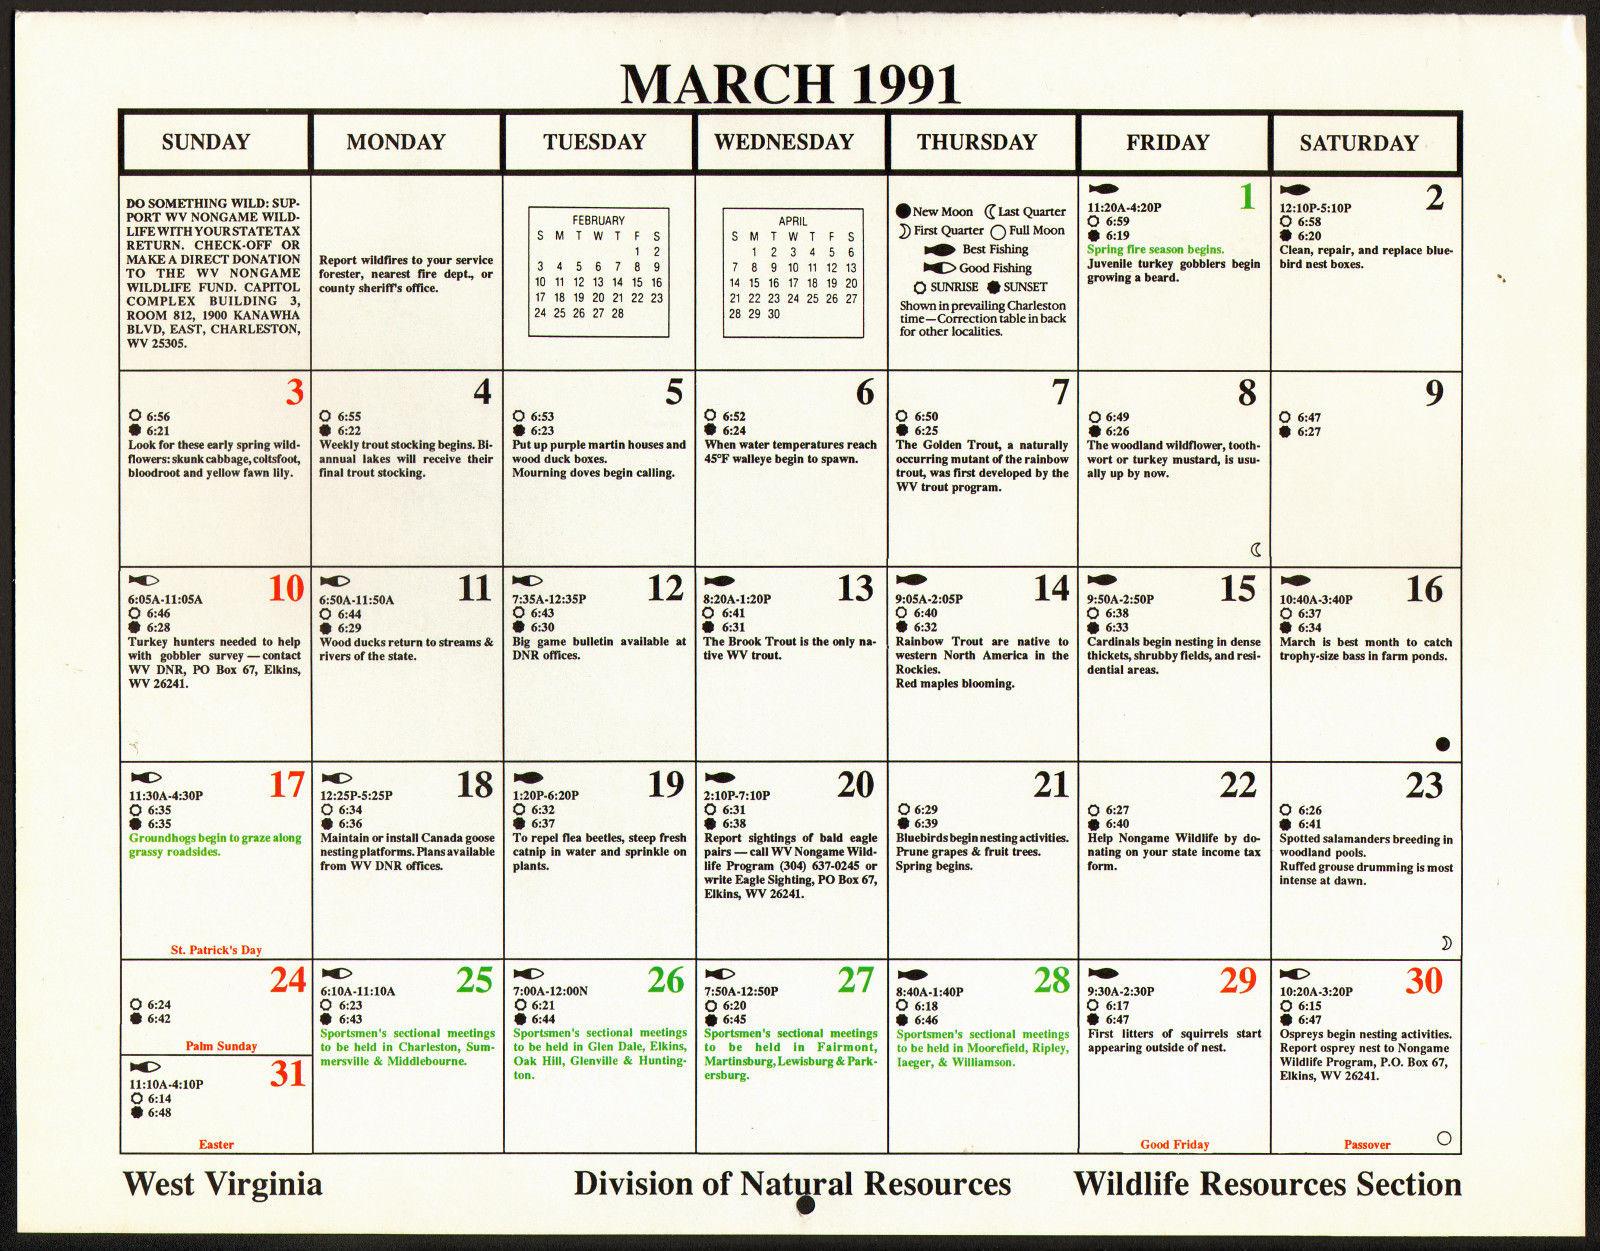 Download 1991 Calendar With Festivals Holidays | 2019 inside 1991 Calendar Year